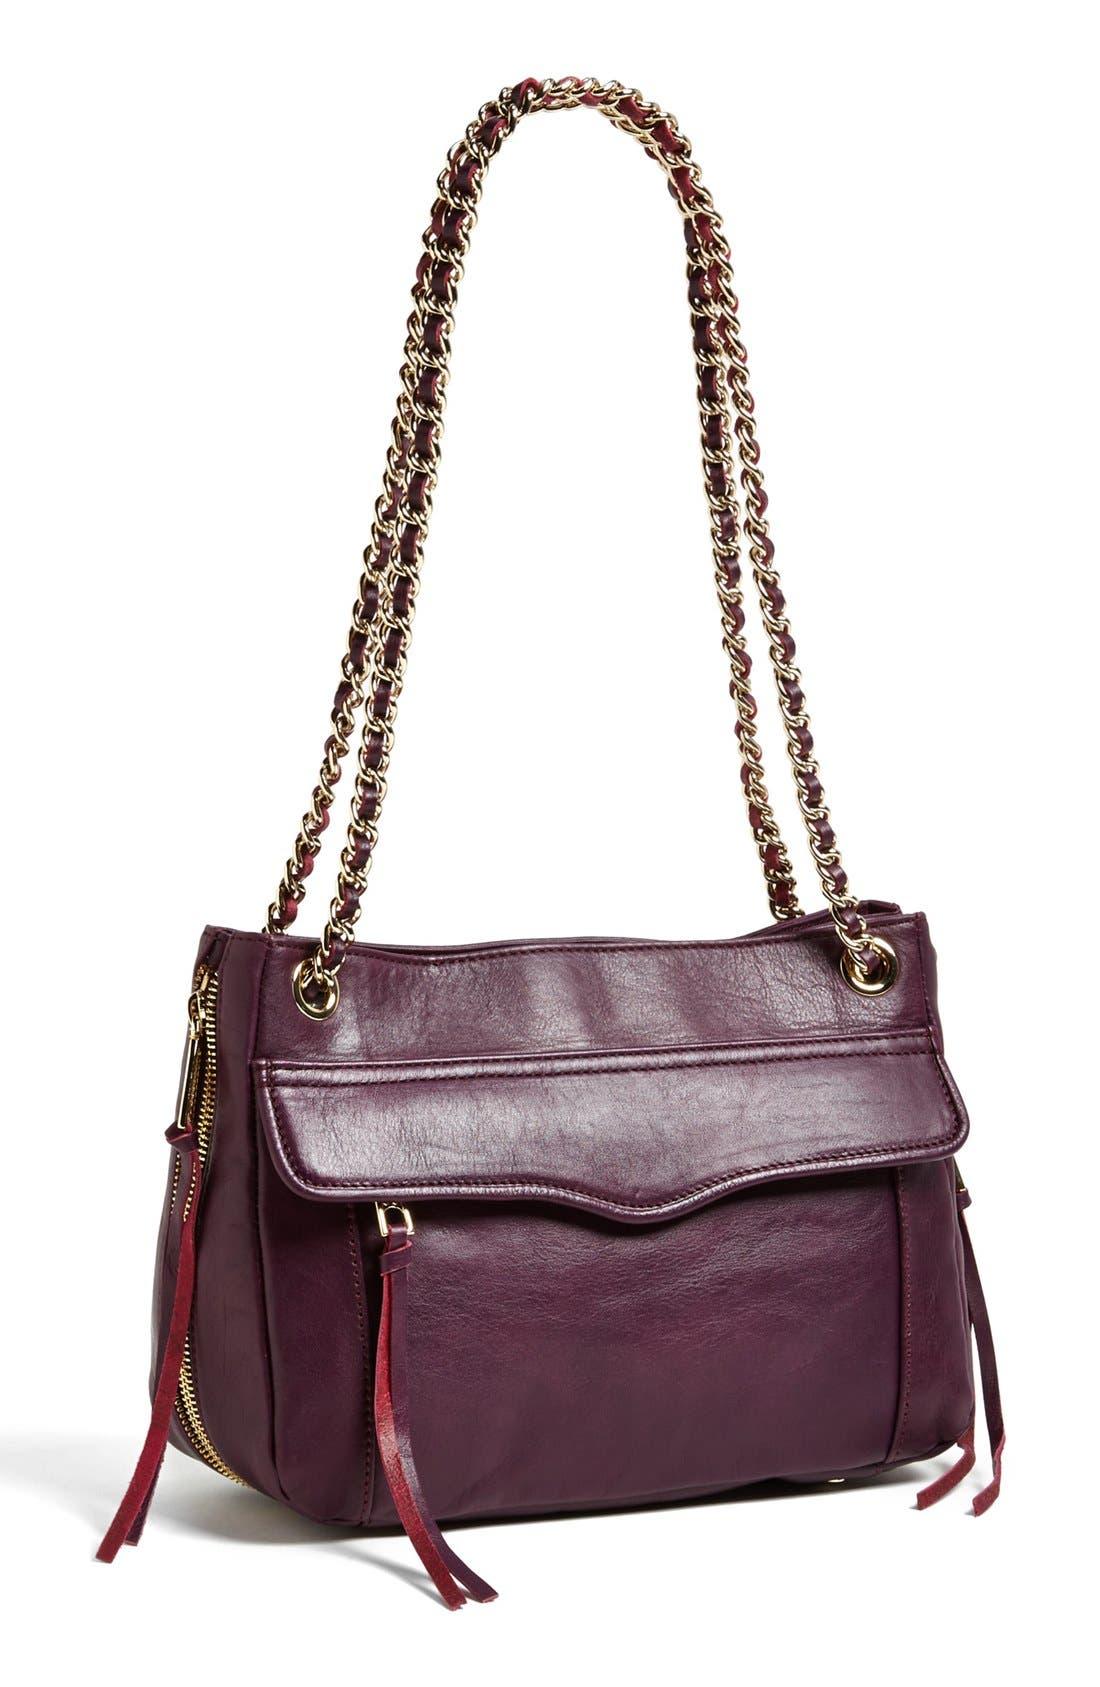 Alternate Image 1 Selected - Rebecca Minkoff 'Swing' Convertible Shoulder Bag